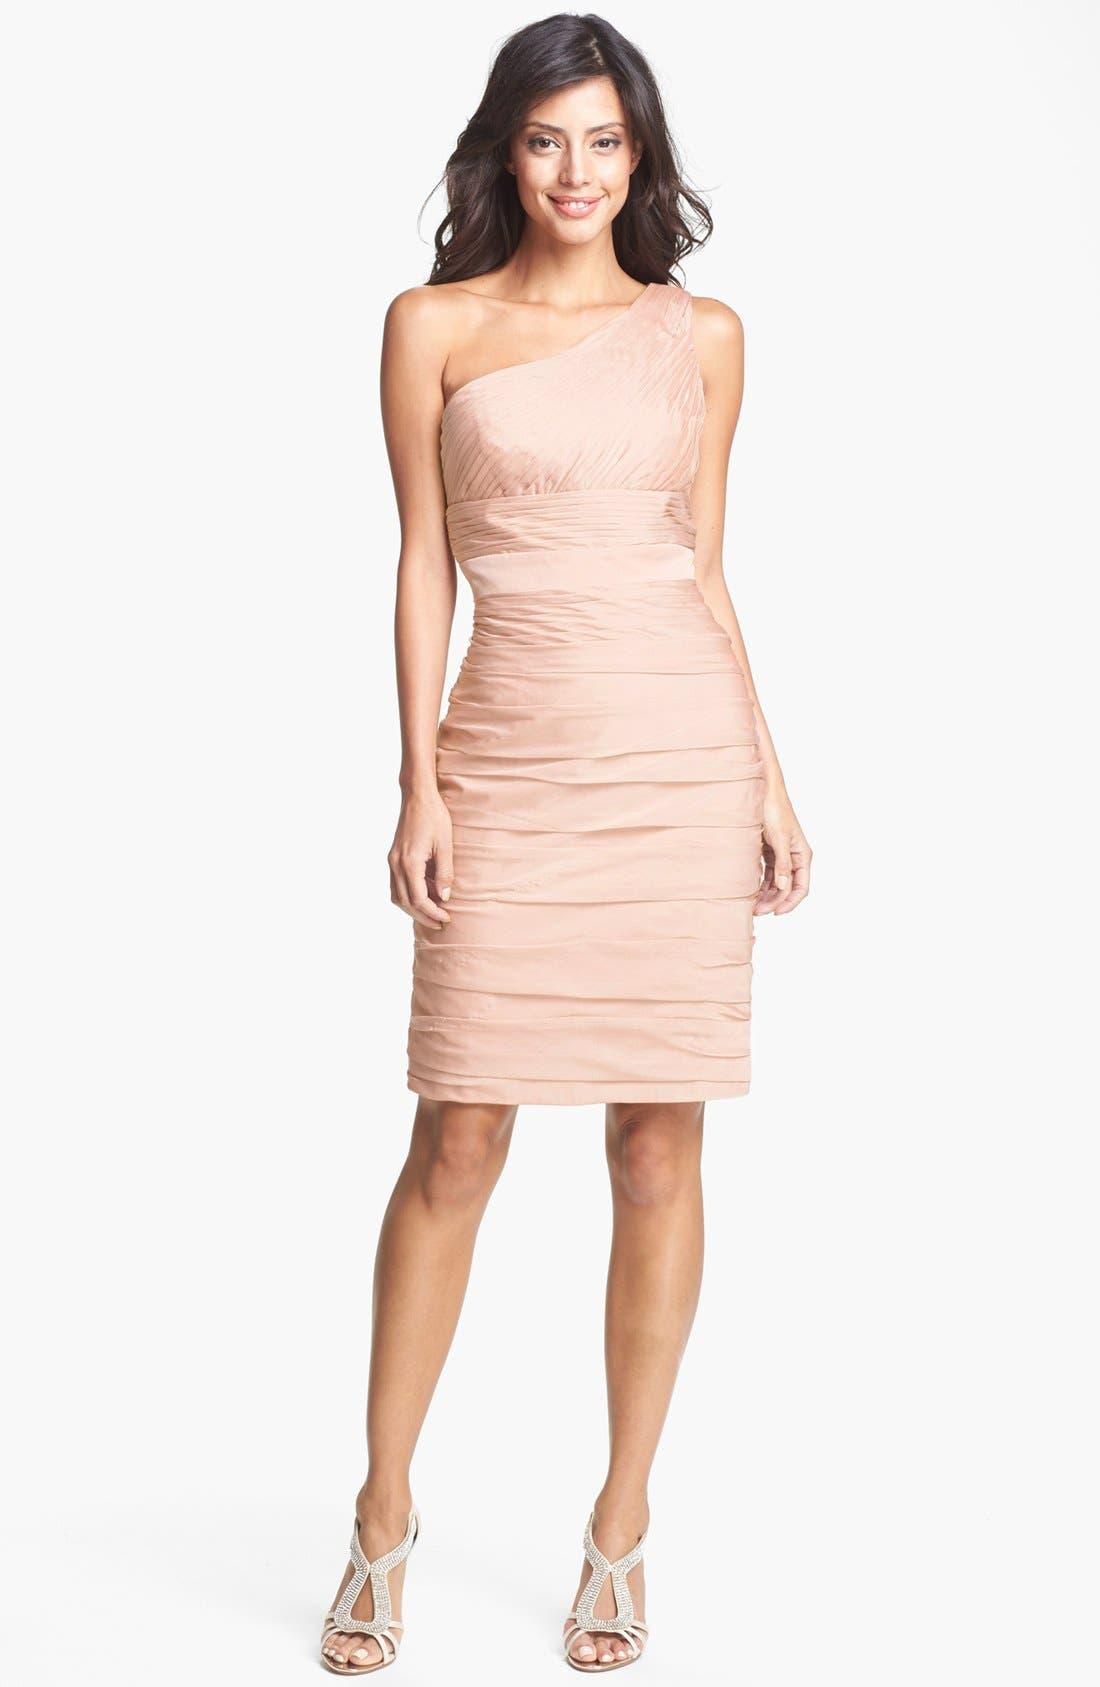 Alternate Image 1 Selected - ML Monique Lhuillier Bridesmaids Ruched One-Shoulder Sheath Dress (Nordstrom Exclusive)